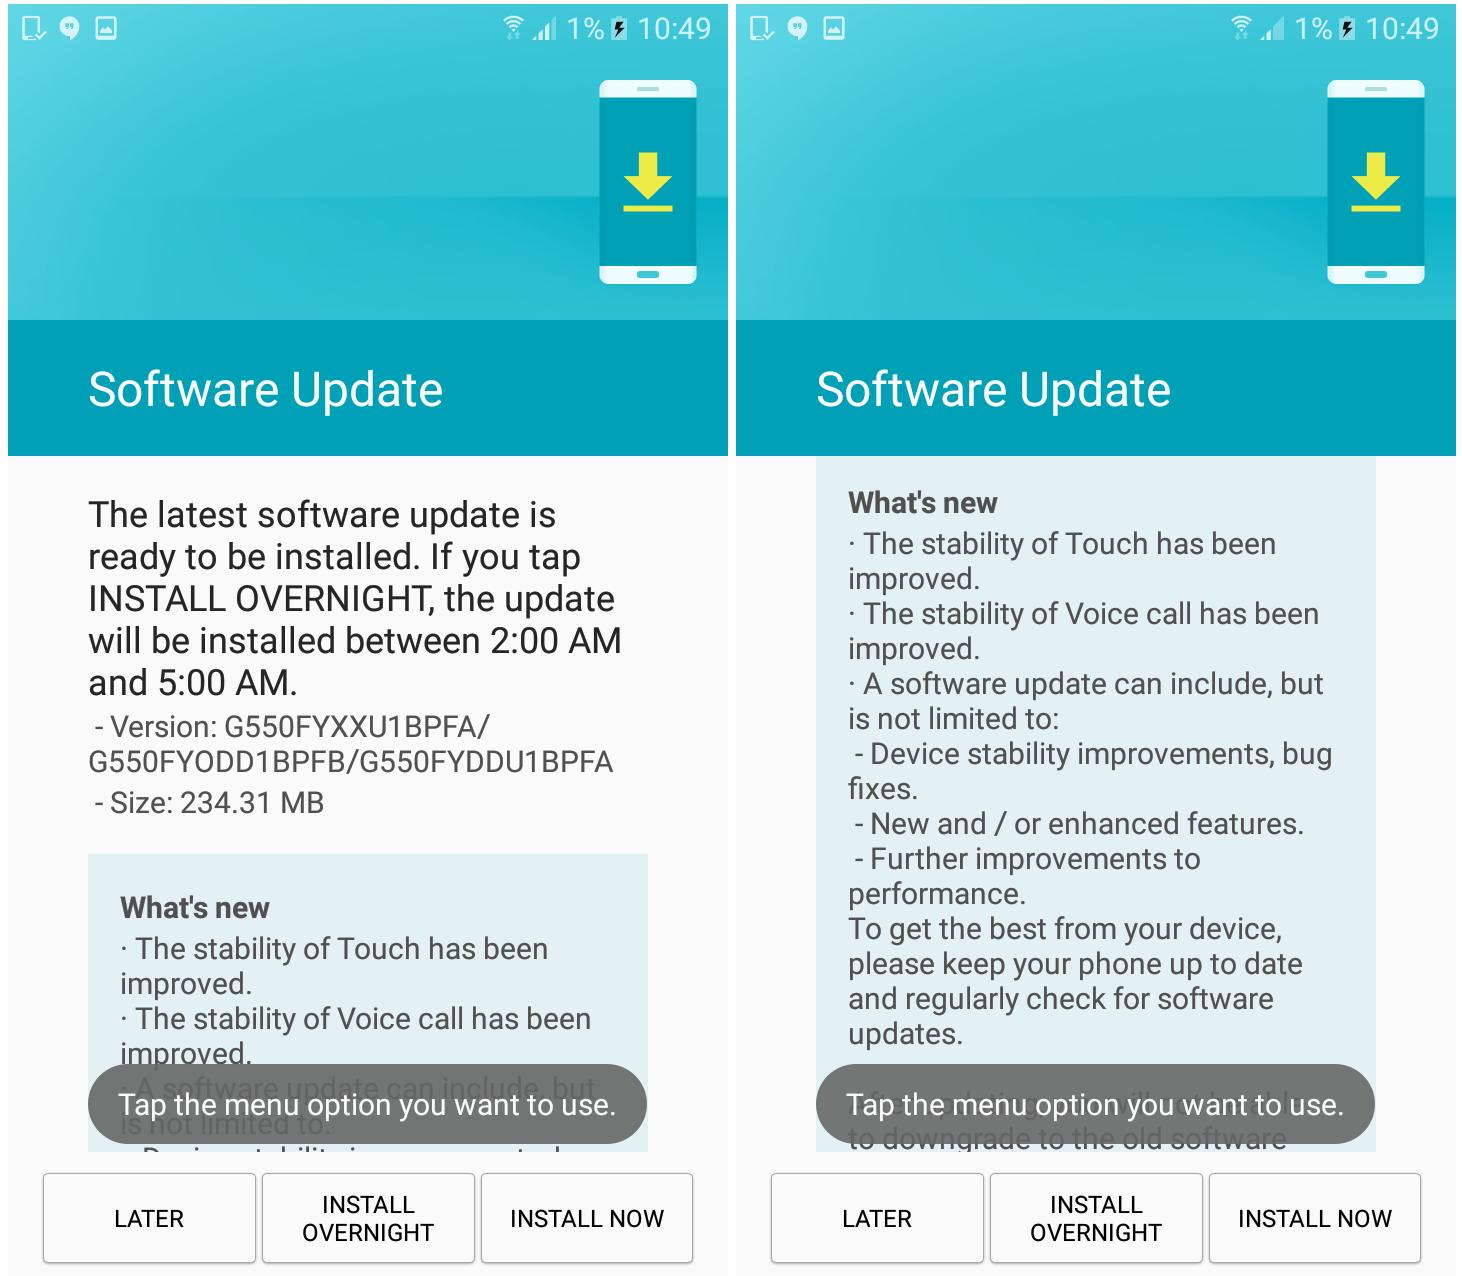 Galaxy On5 Pro Software Update